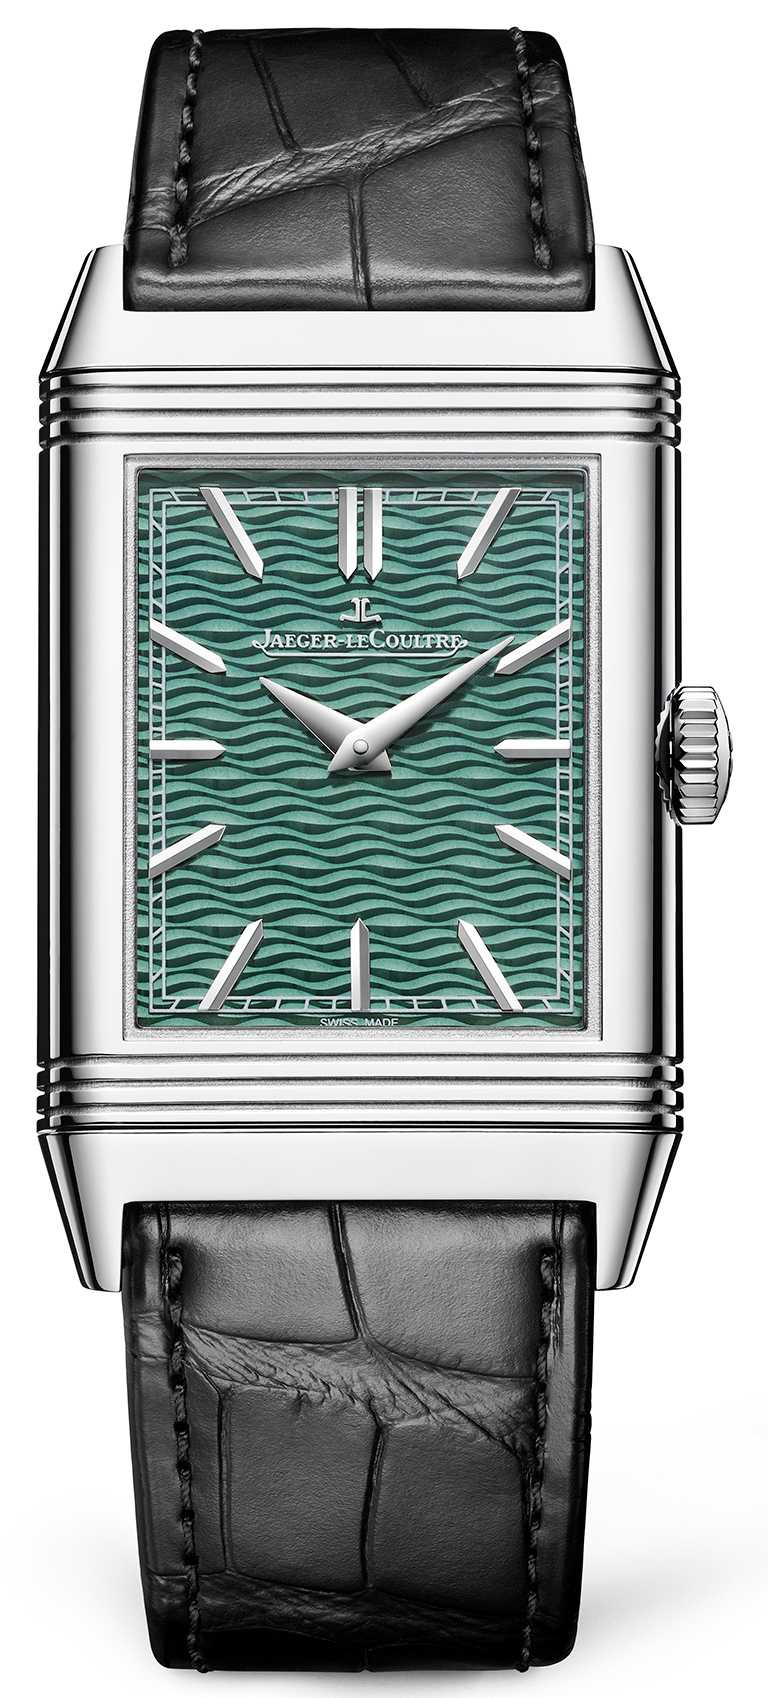 JAEGER-LECOULTRE「Reverso Tribute Enamel」翻轉系列琺瑯腕錶,45.5mm,白金錶殼,822型手動上鏈機芯,限量10只╱2,800,000元。(圖╱JAEGER-LECOULTRE提供)